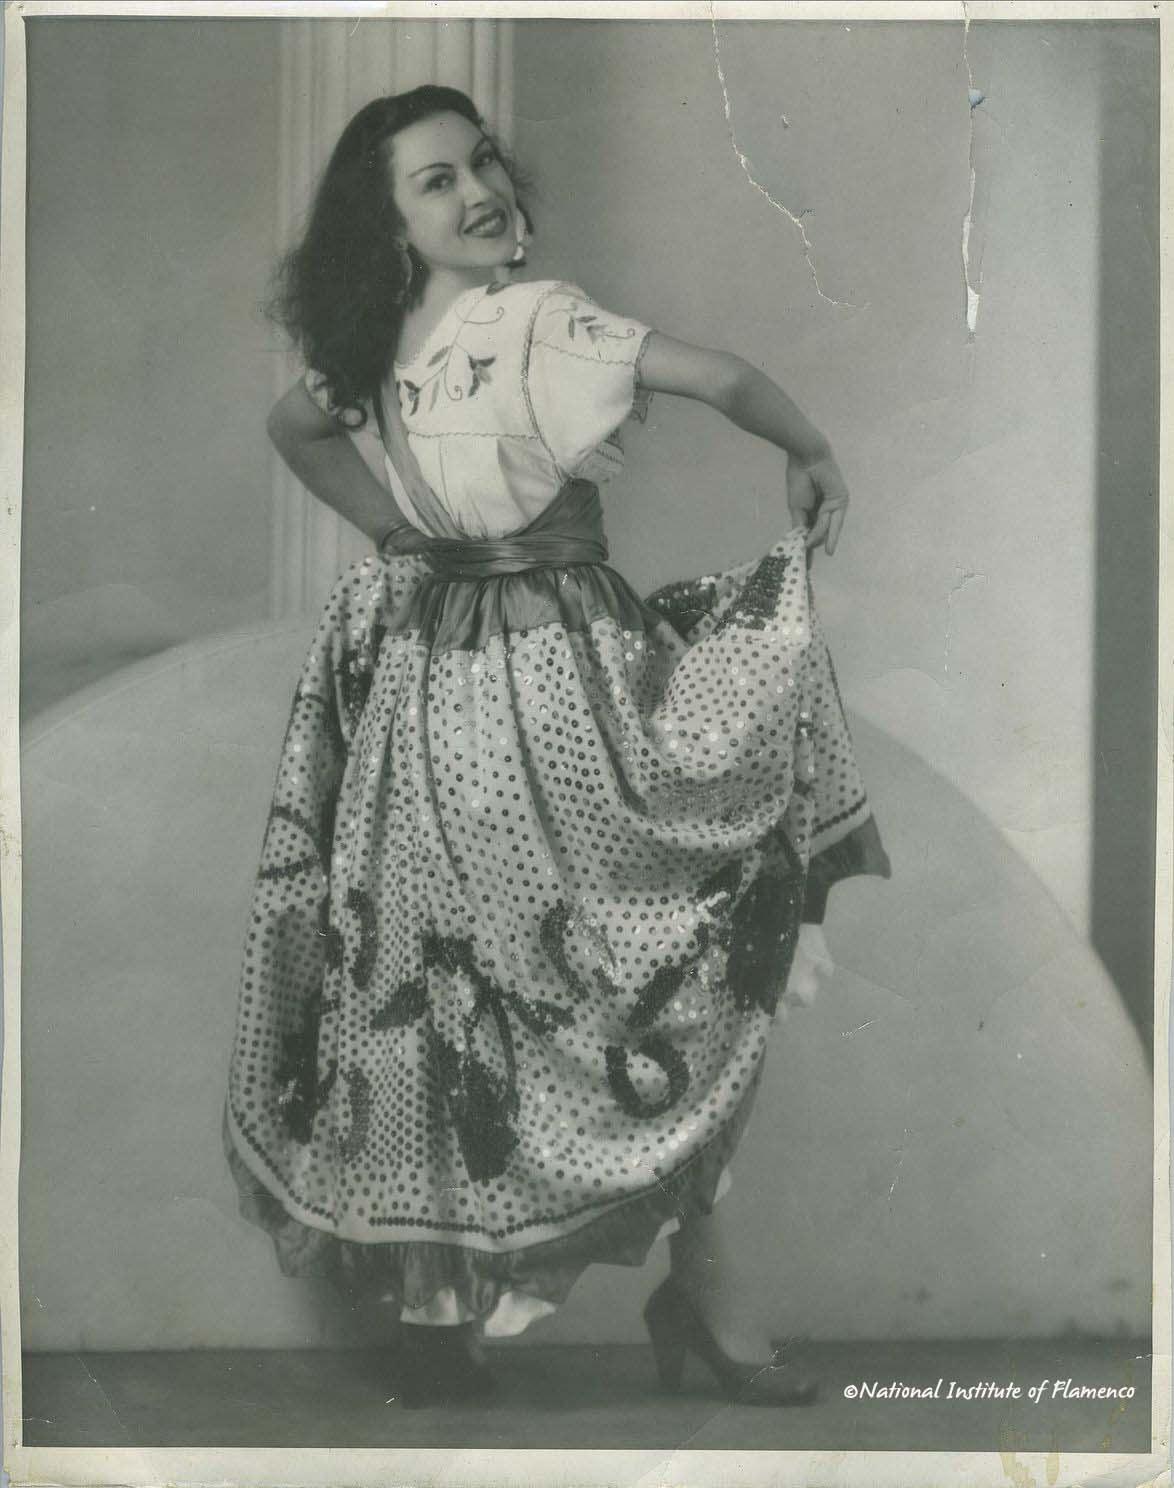 National Institute of Flamenco - Clarita Garcia de Aranda